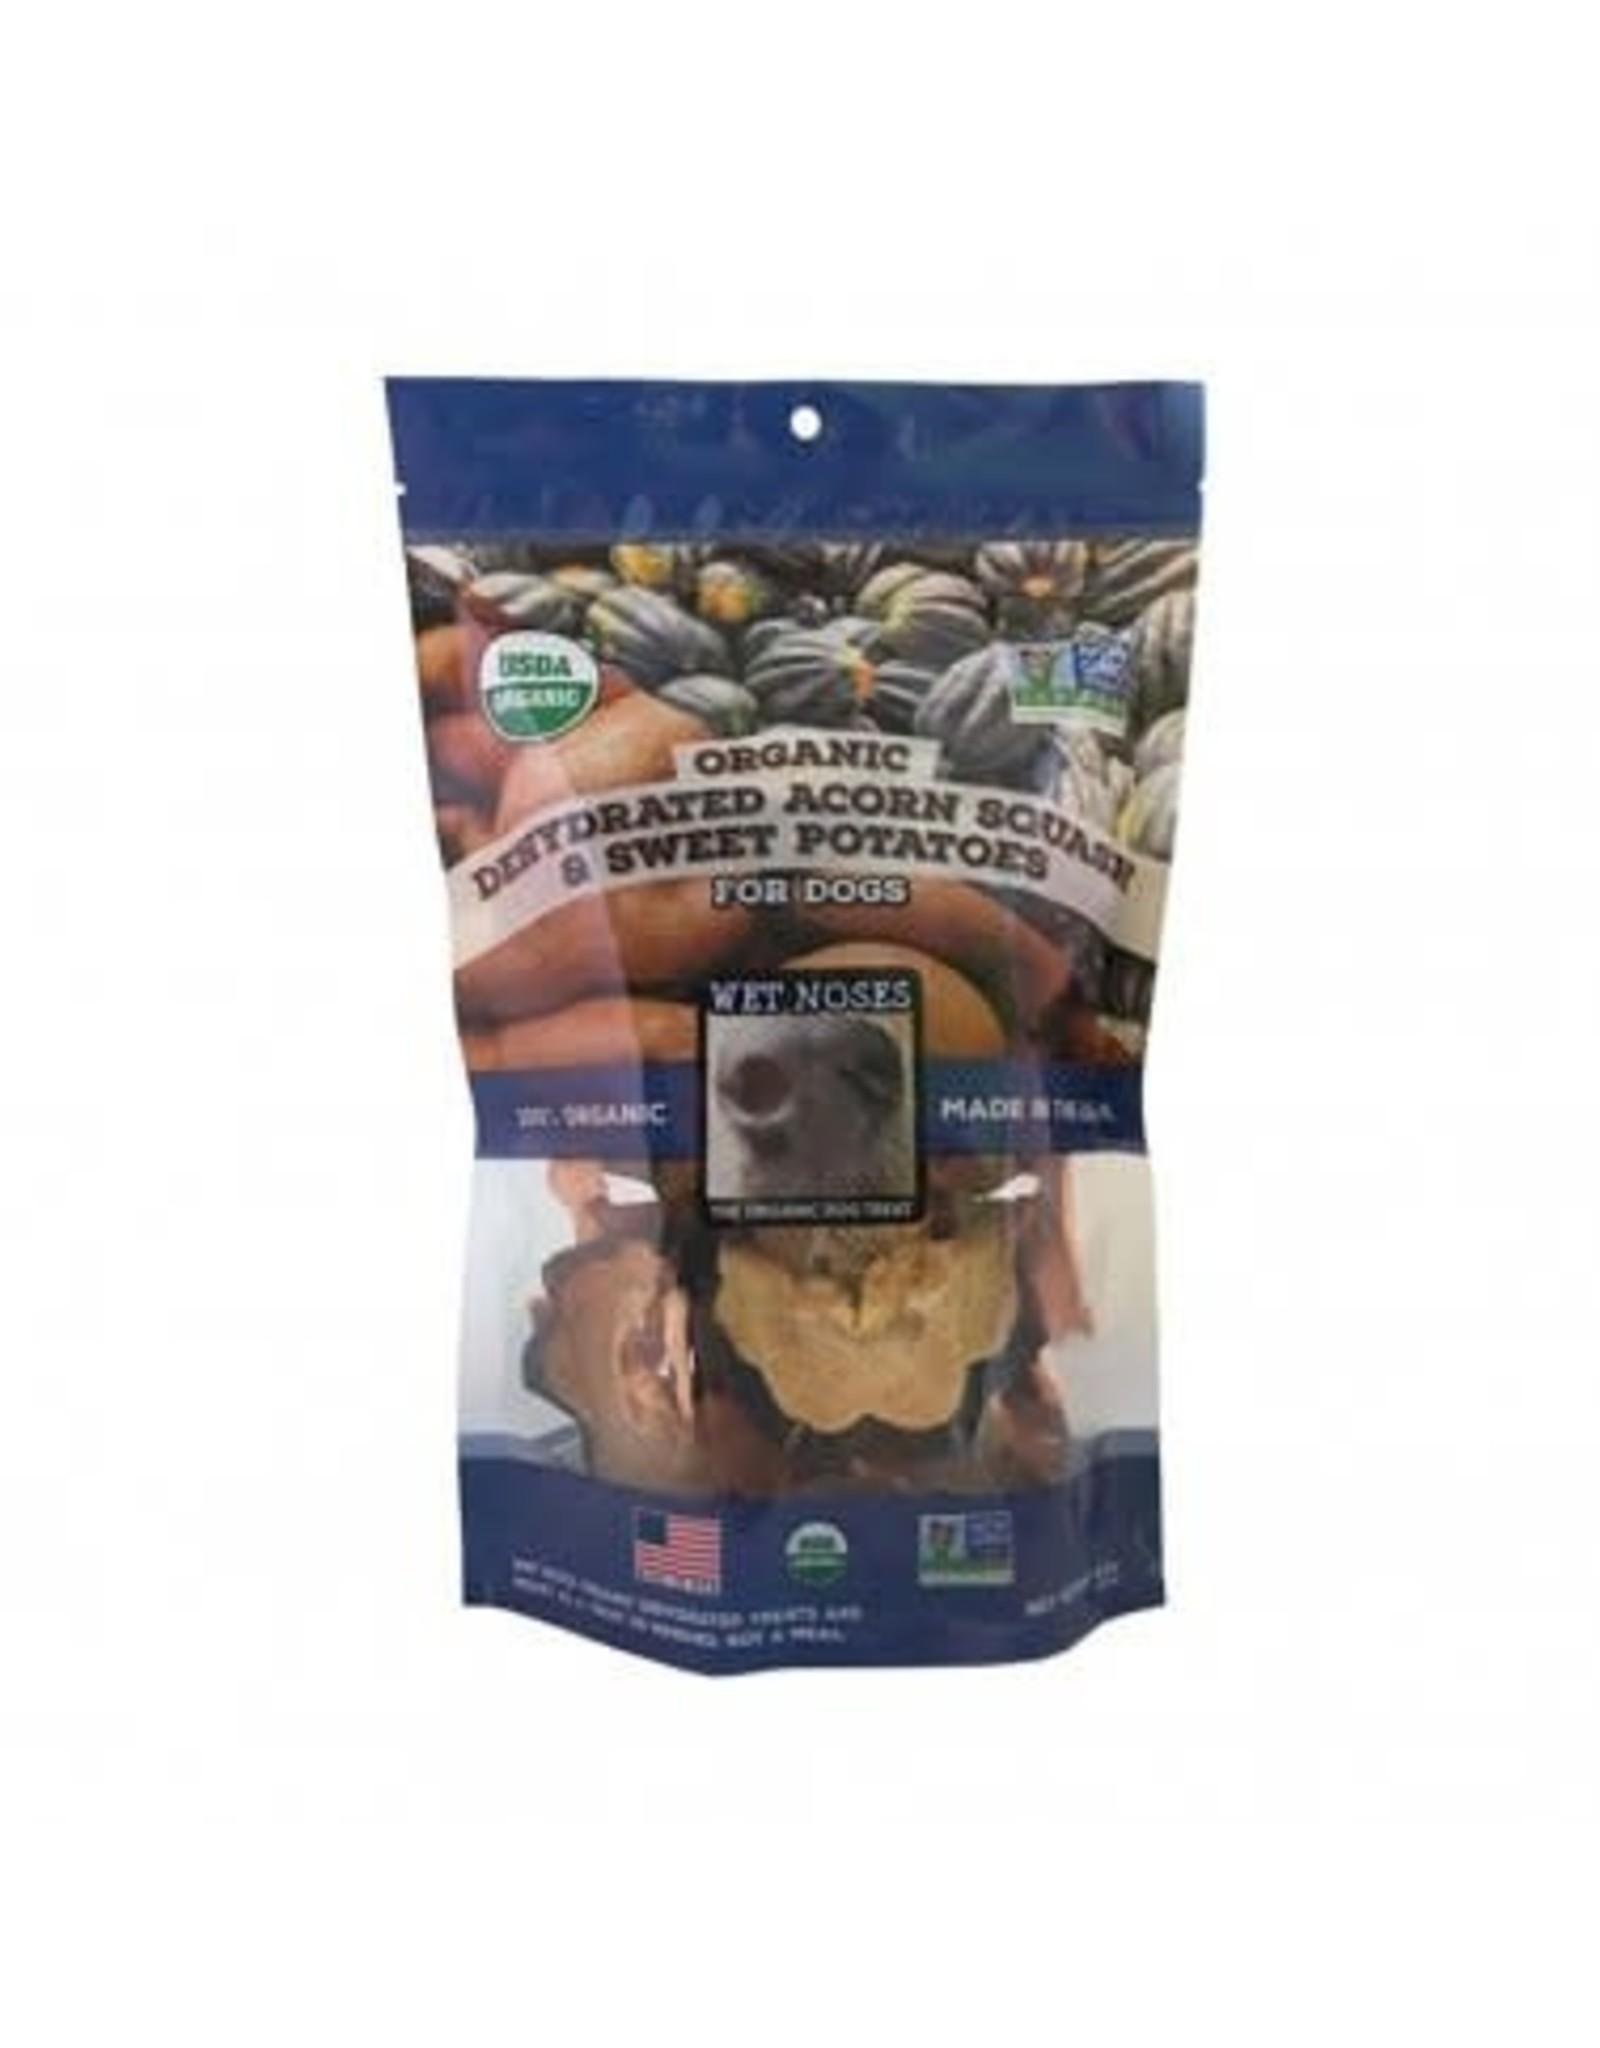 Wet Noses Wet Noses Organic Dehydrated Acorn Squash & Sweet Potatoes 4.5oz